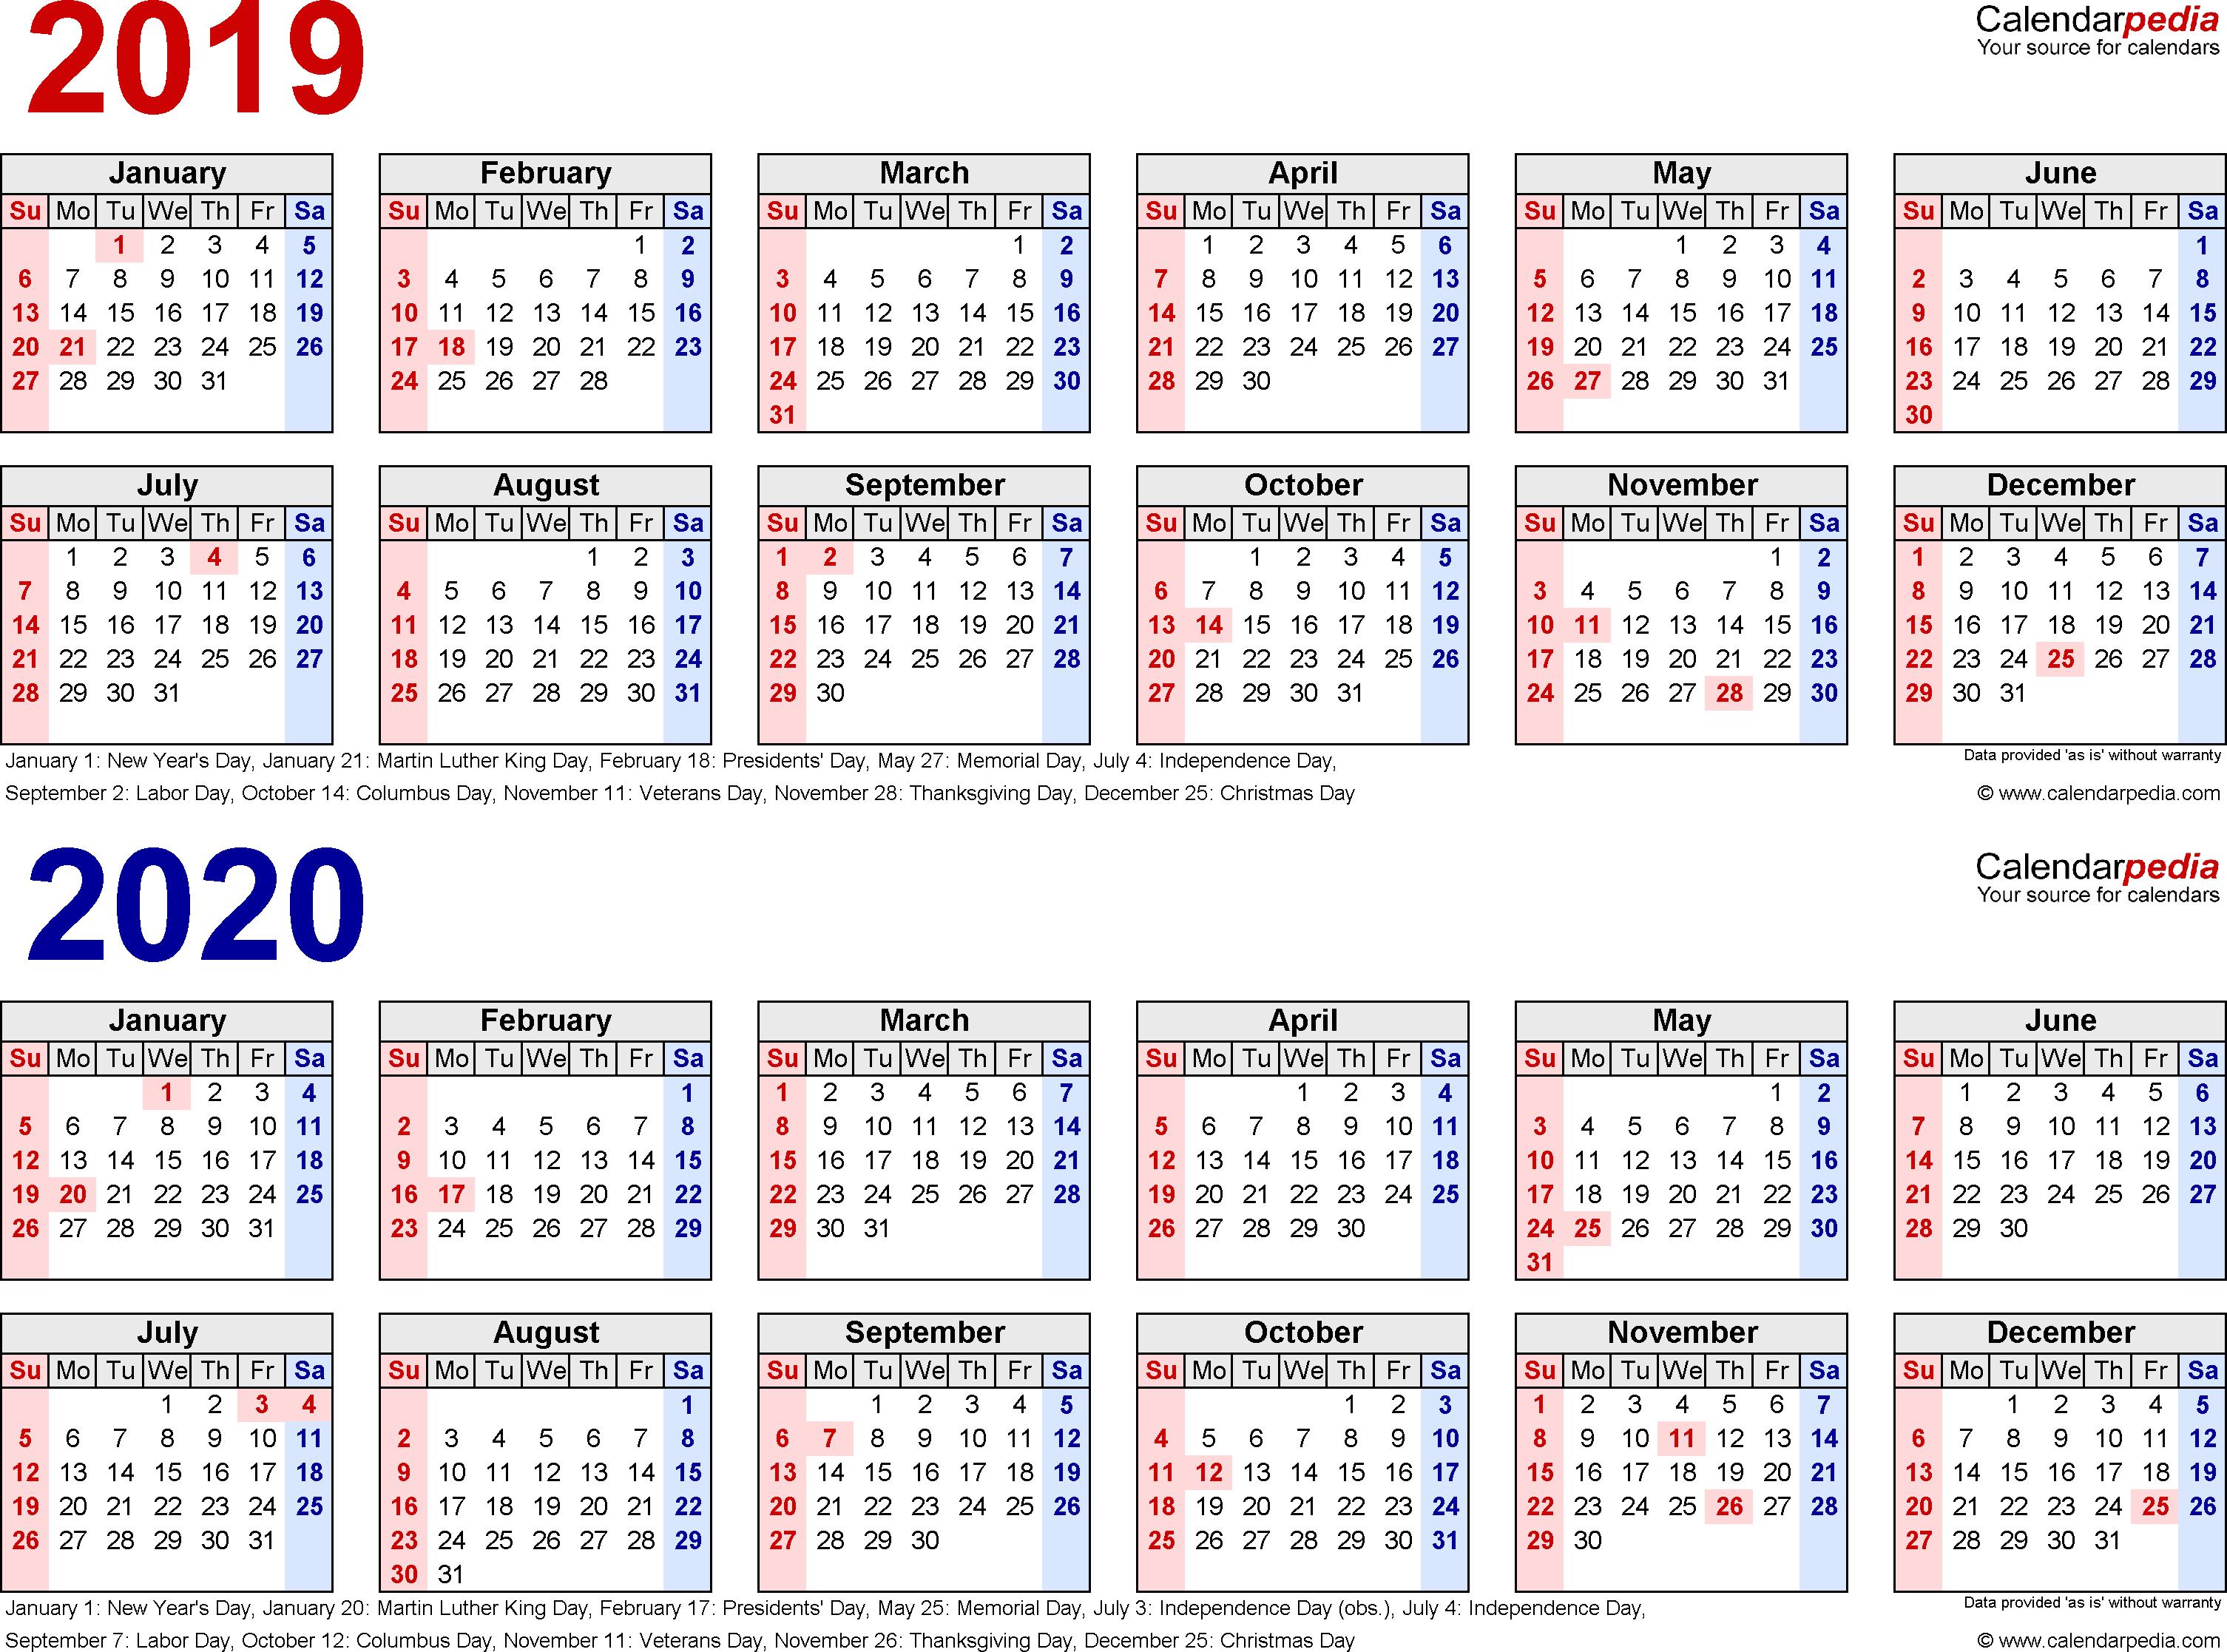 2019-2020 Calendar - Free Printable Two-Year Pdf Calendars within 2019-2020 Blank Calendar To Print